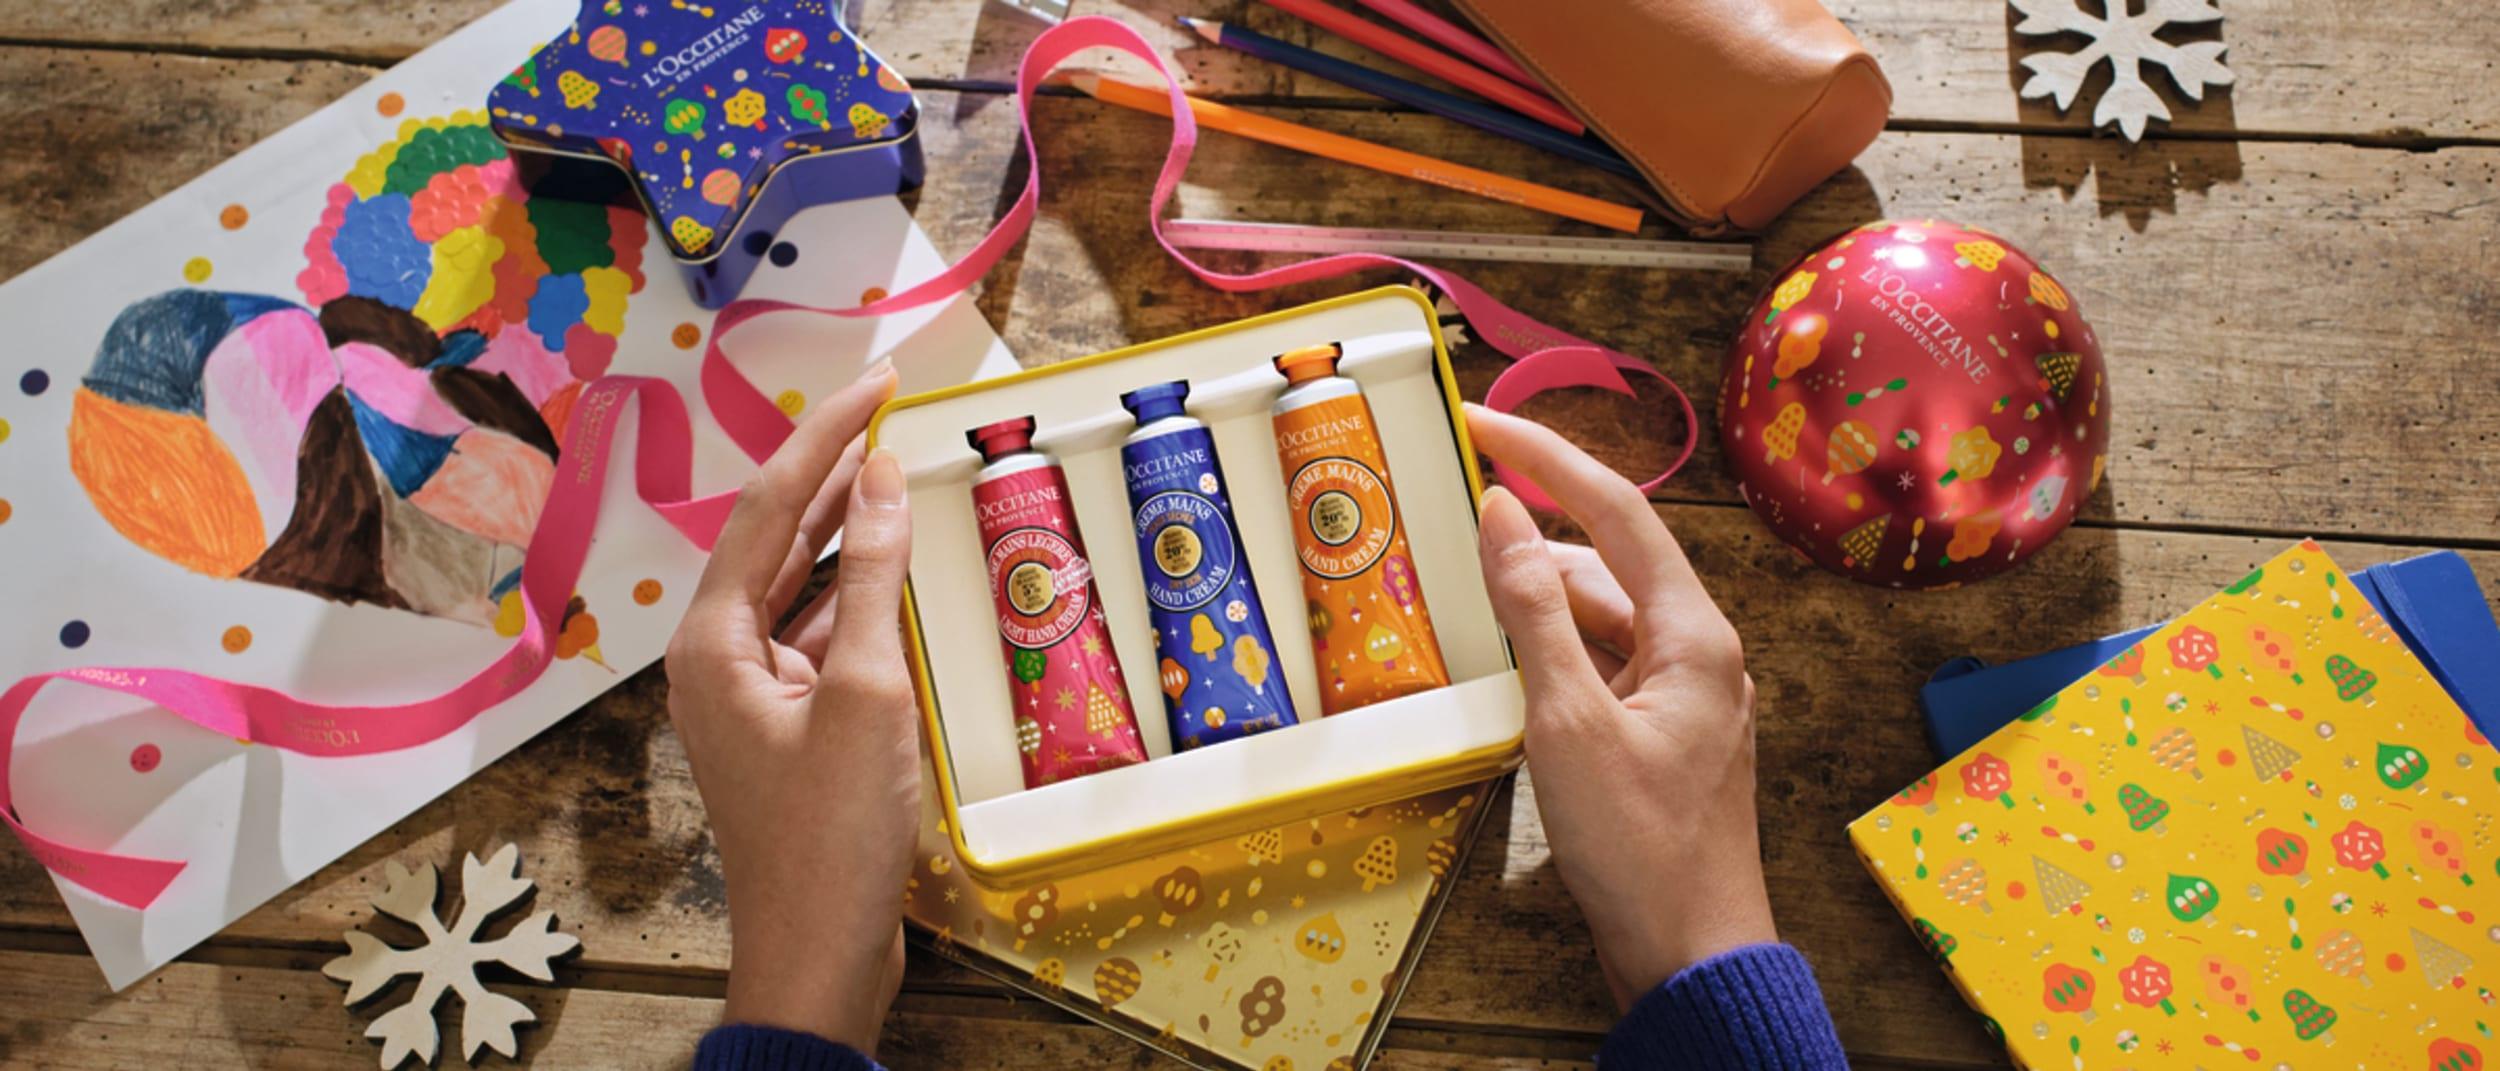 L'OCCITANE: Art of gifting